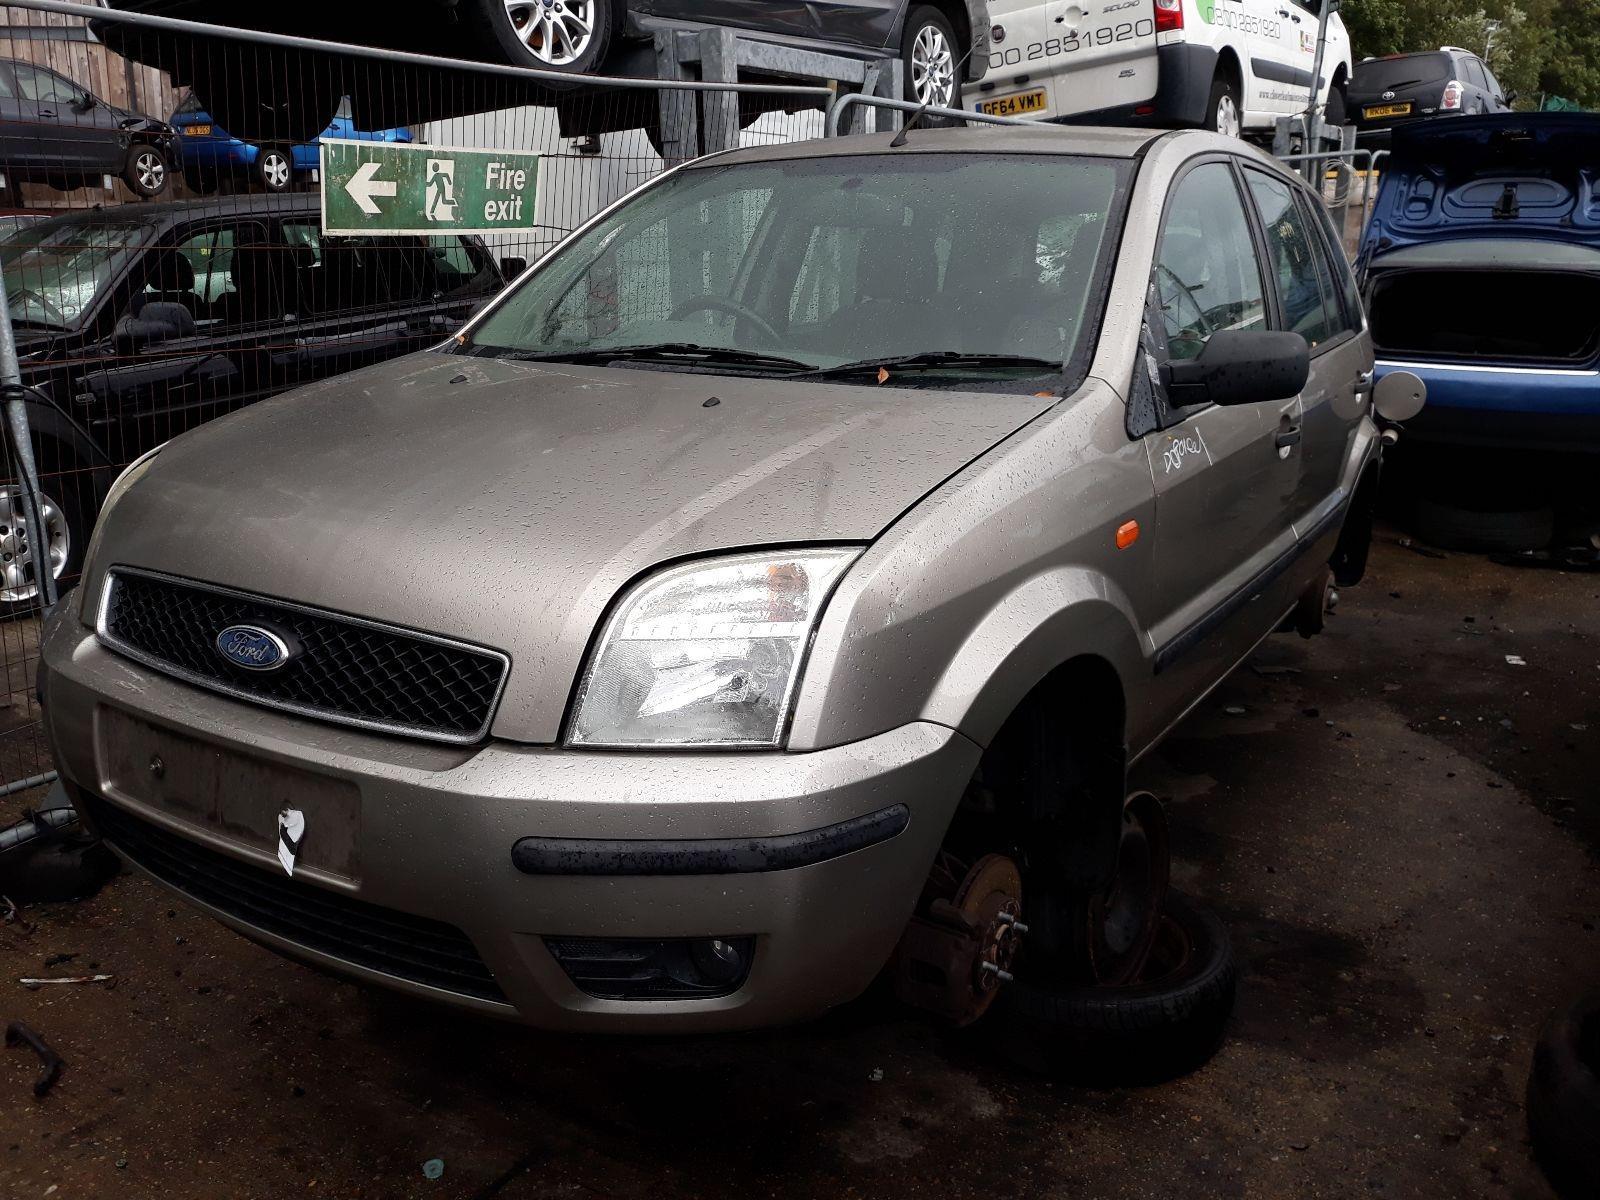 Ford Fusion 2003 To 2012 3 5 Door Hatchback scrap salvage car